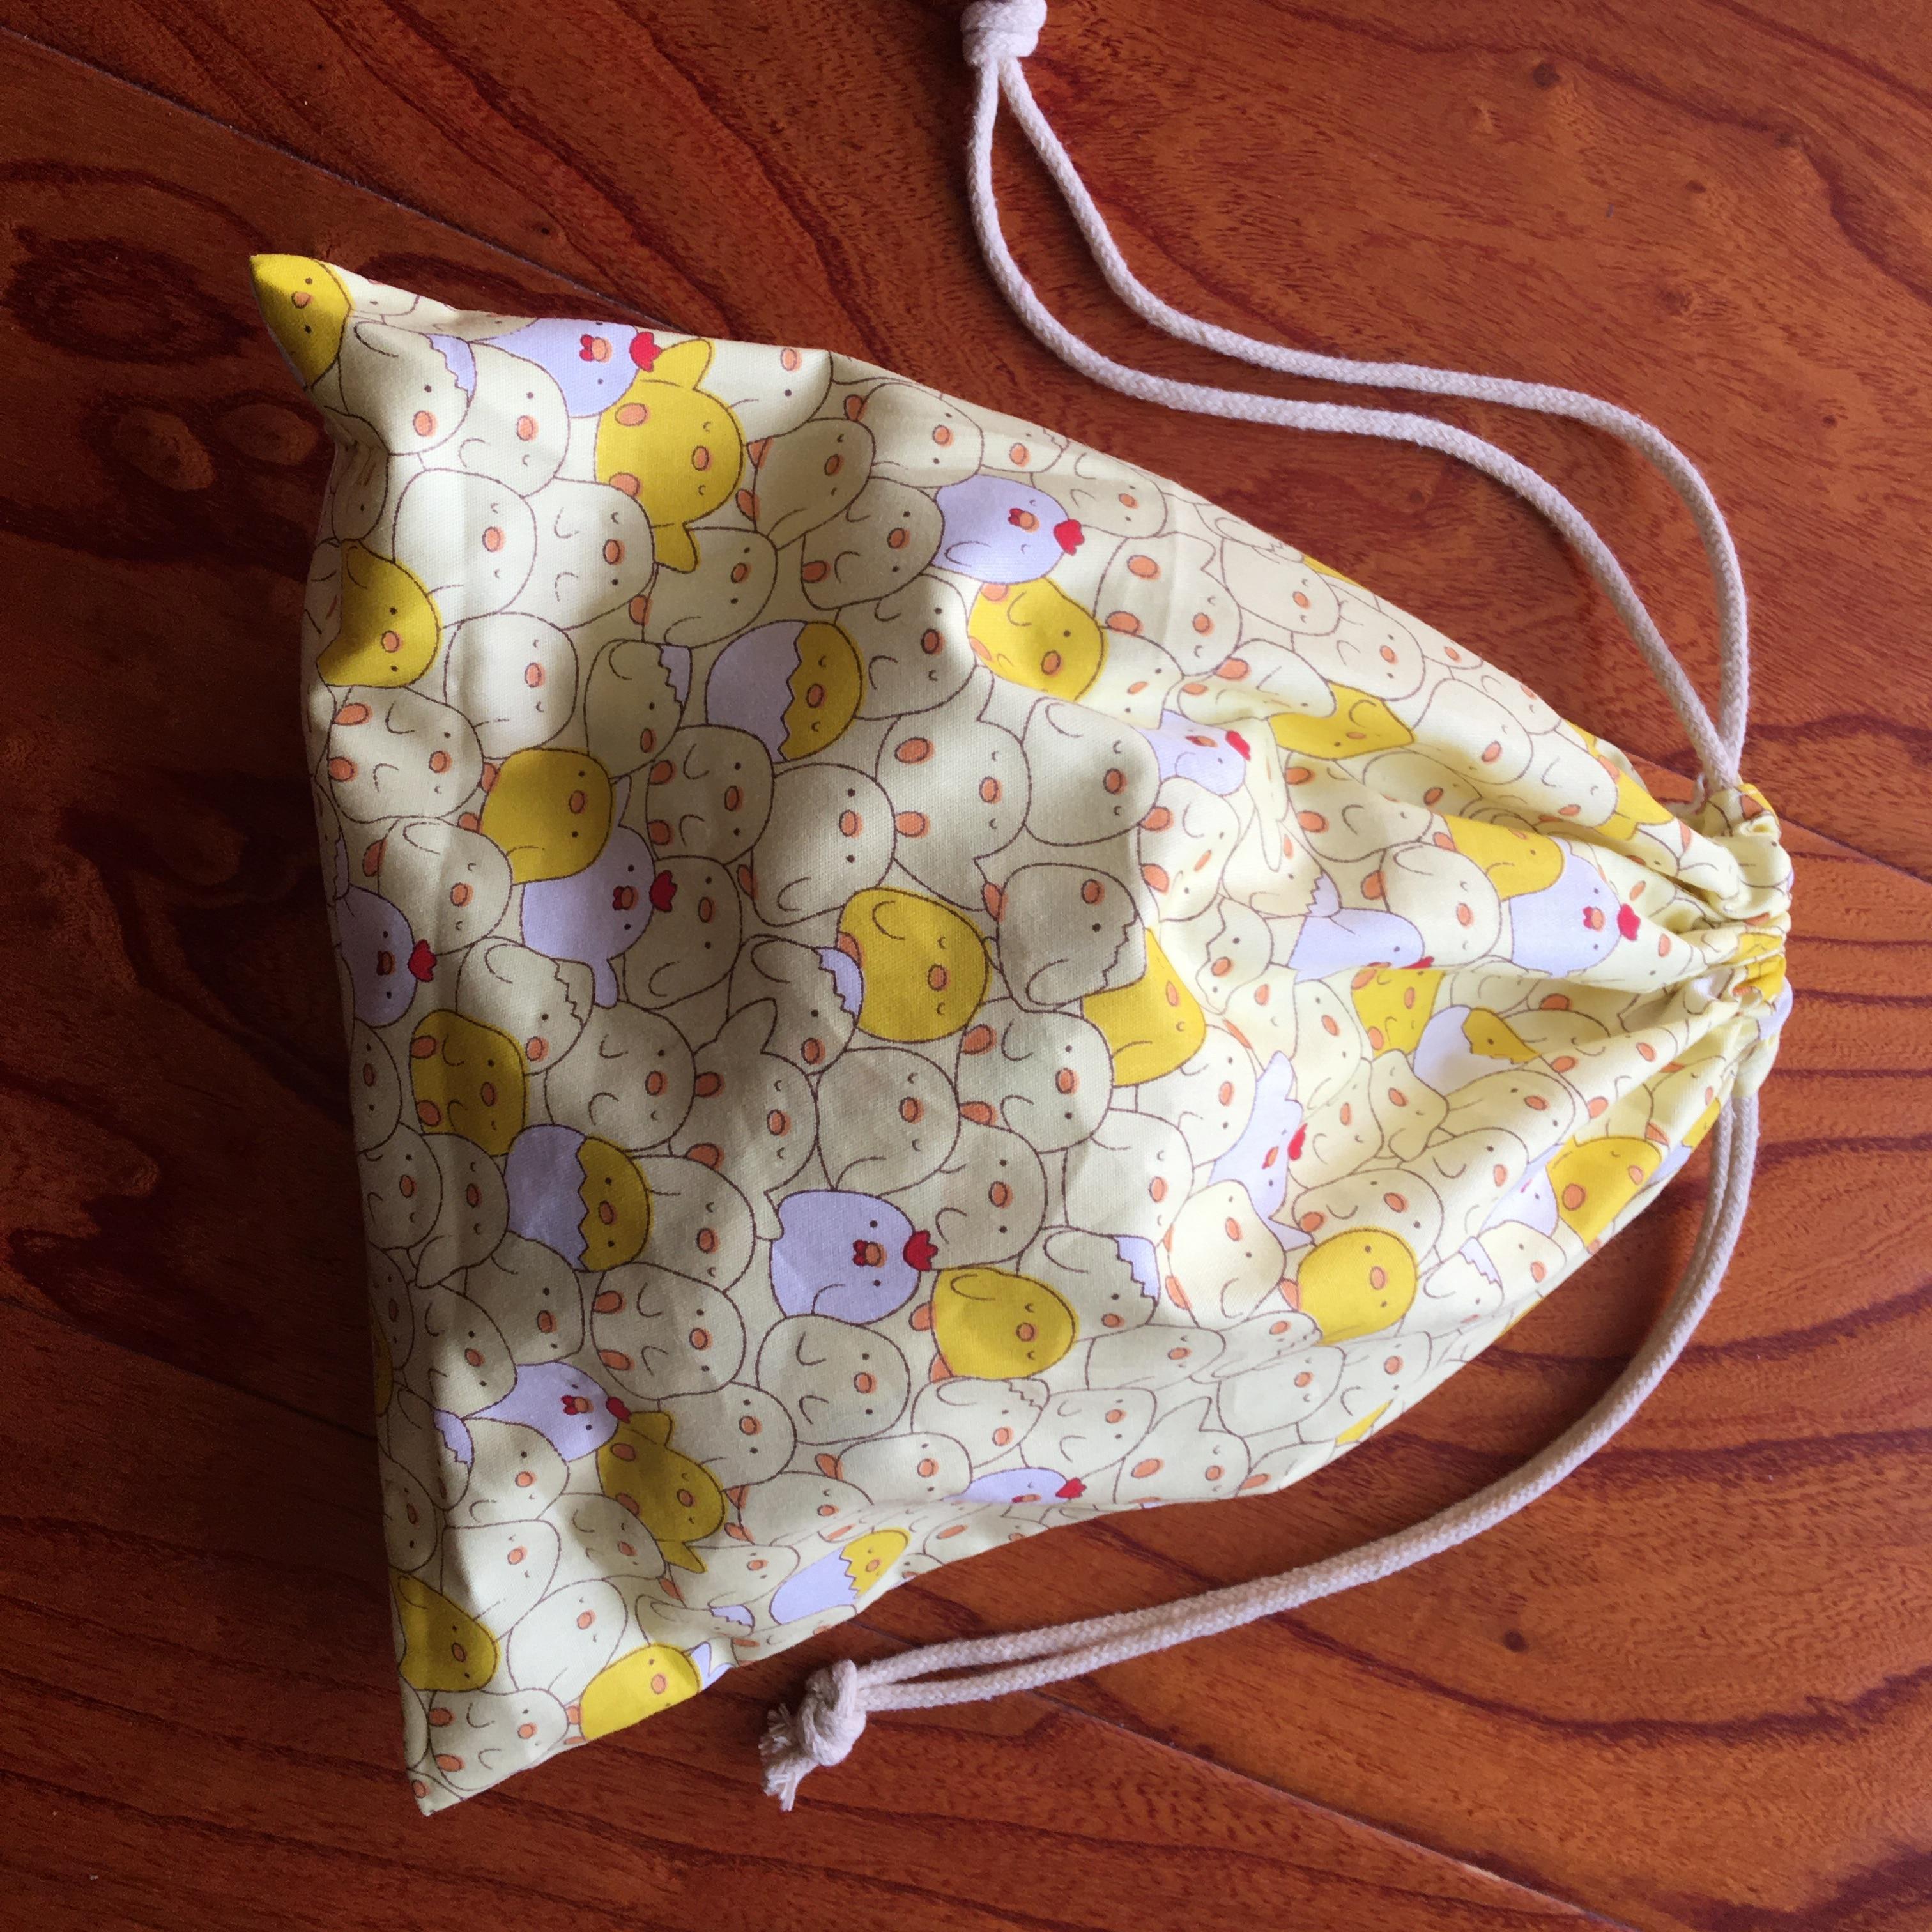 1pc Cotton Drawstring Pouch Multi-purpose Bag Cartoon Yellow White Duck Party Gift Bag YILE